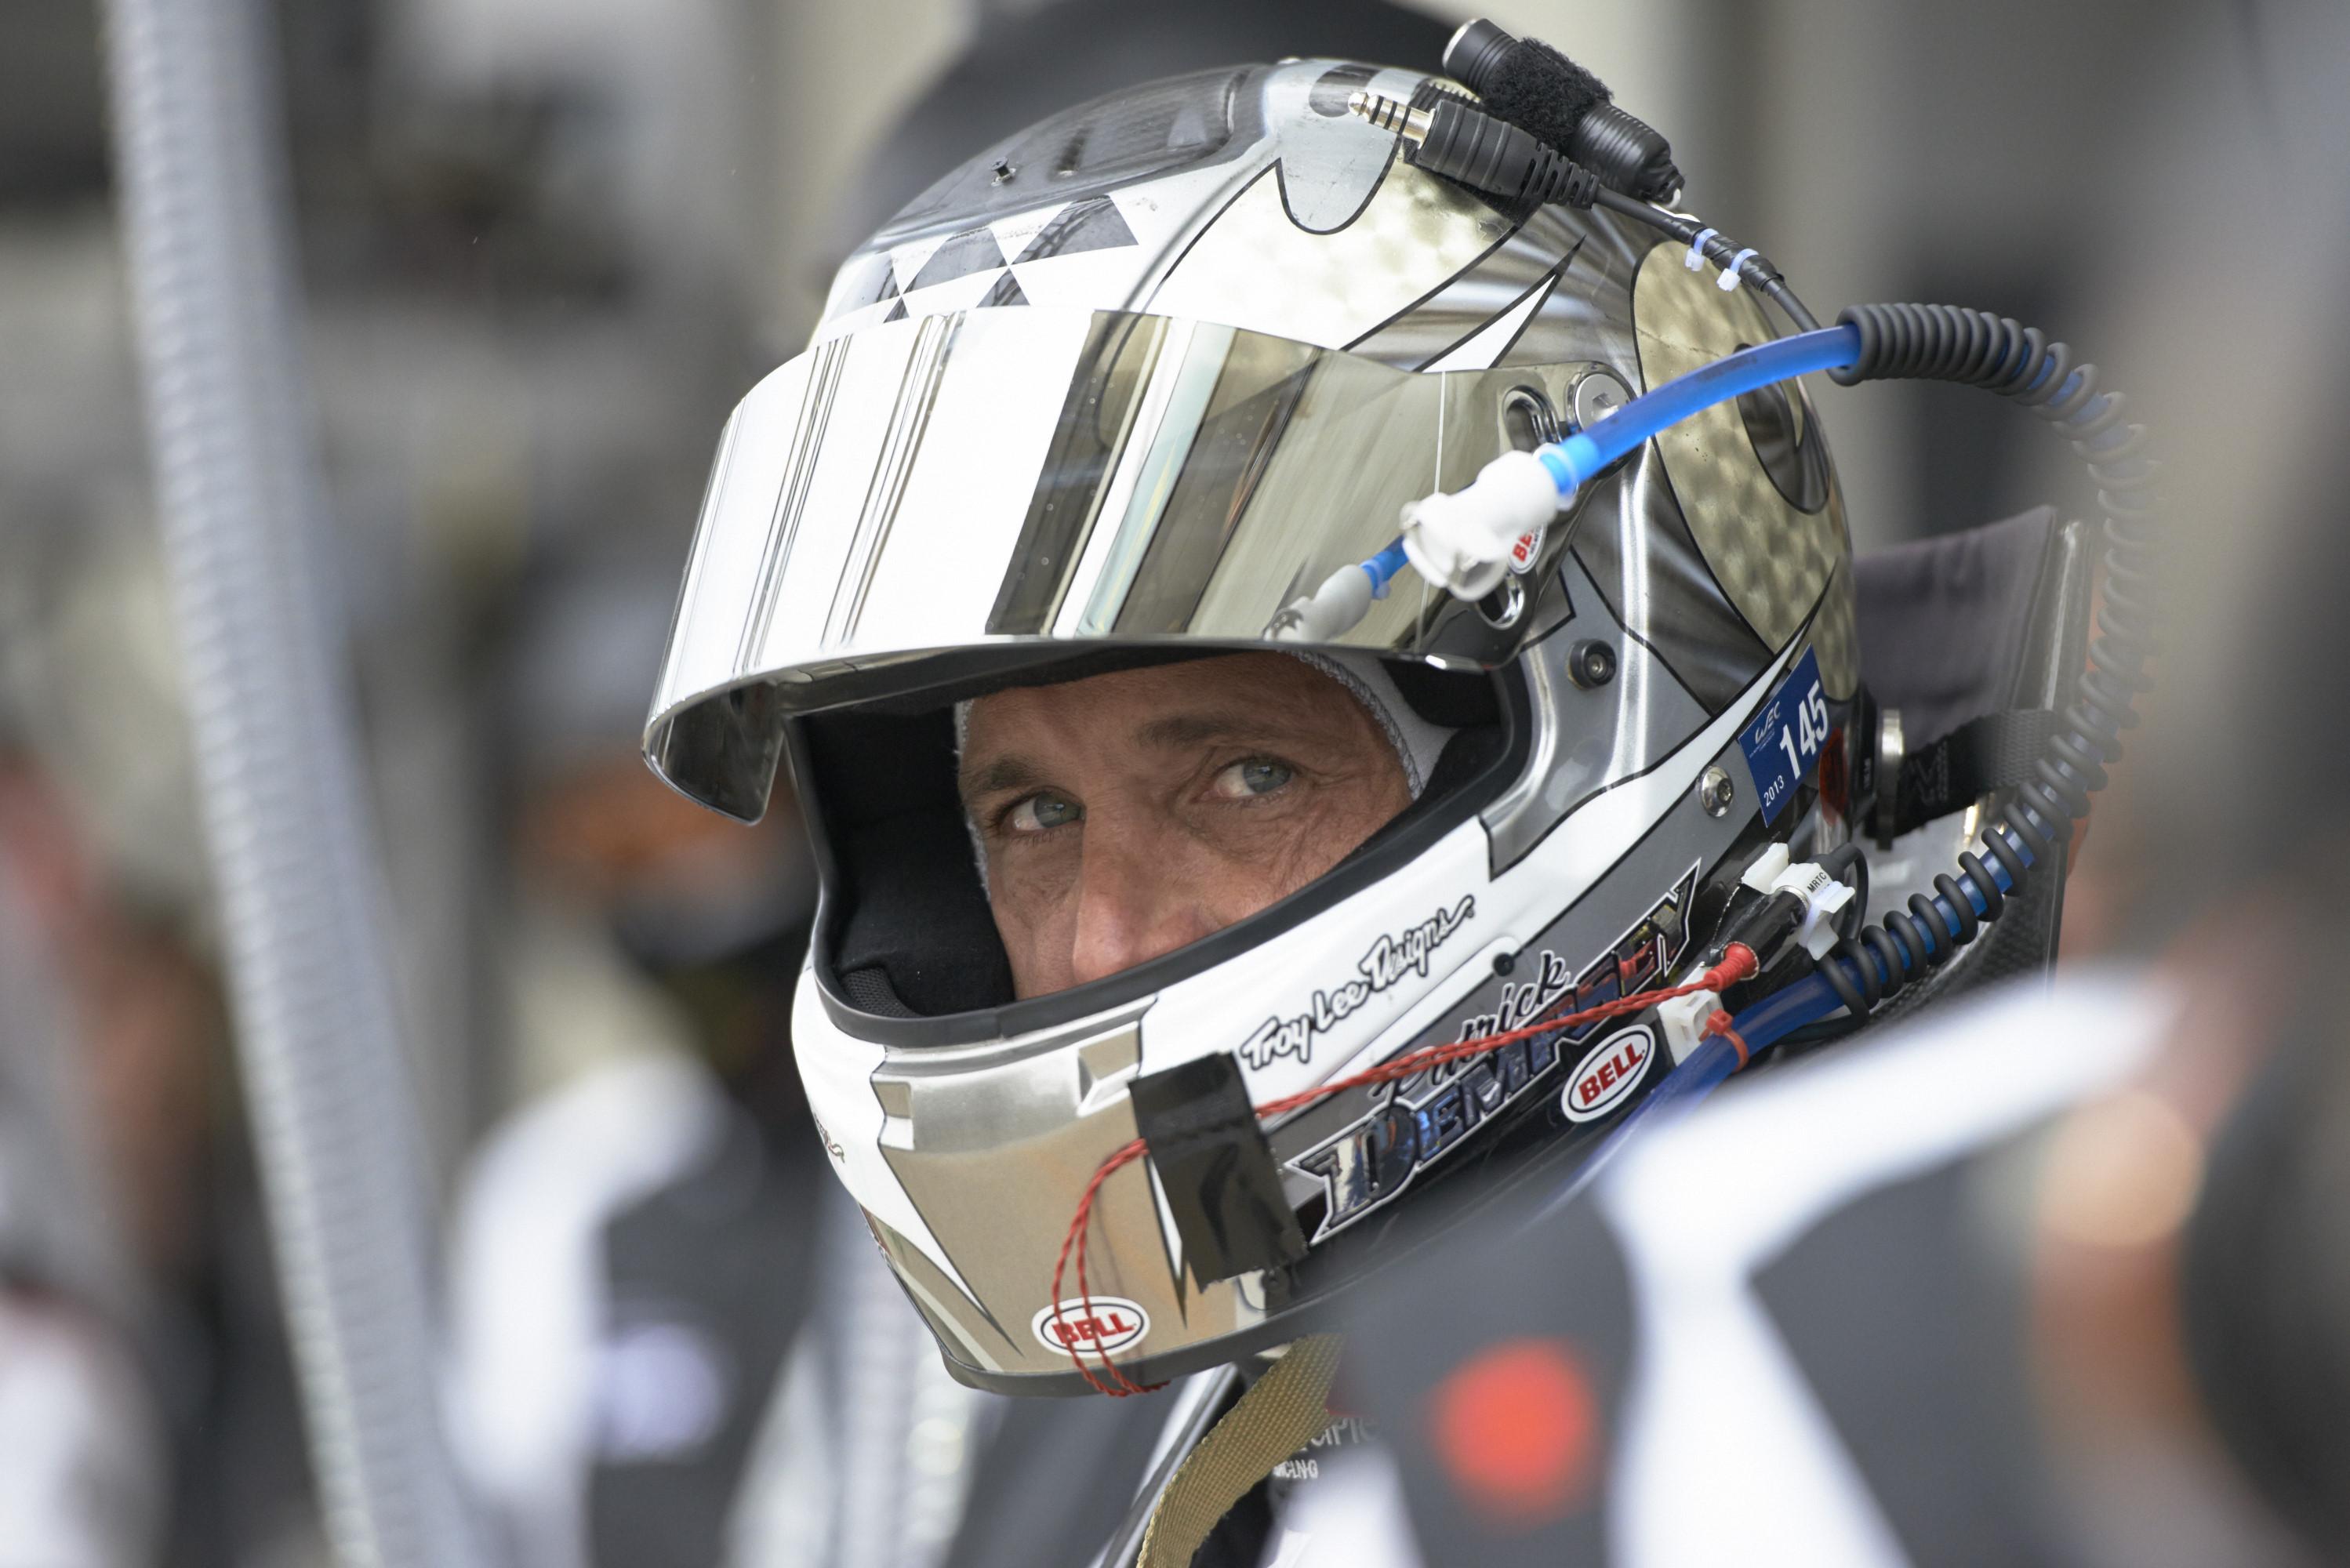 Dempsey Racing Porsche Everyday Dedeporsches Blog